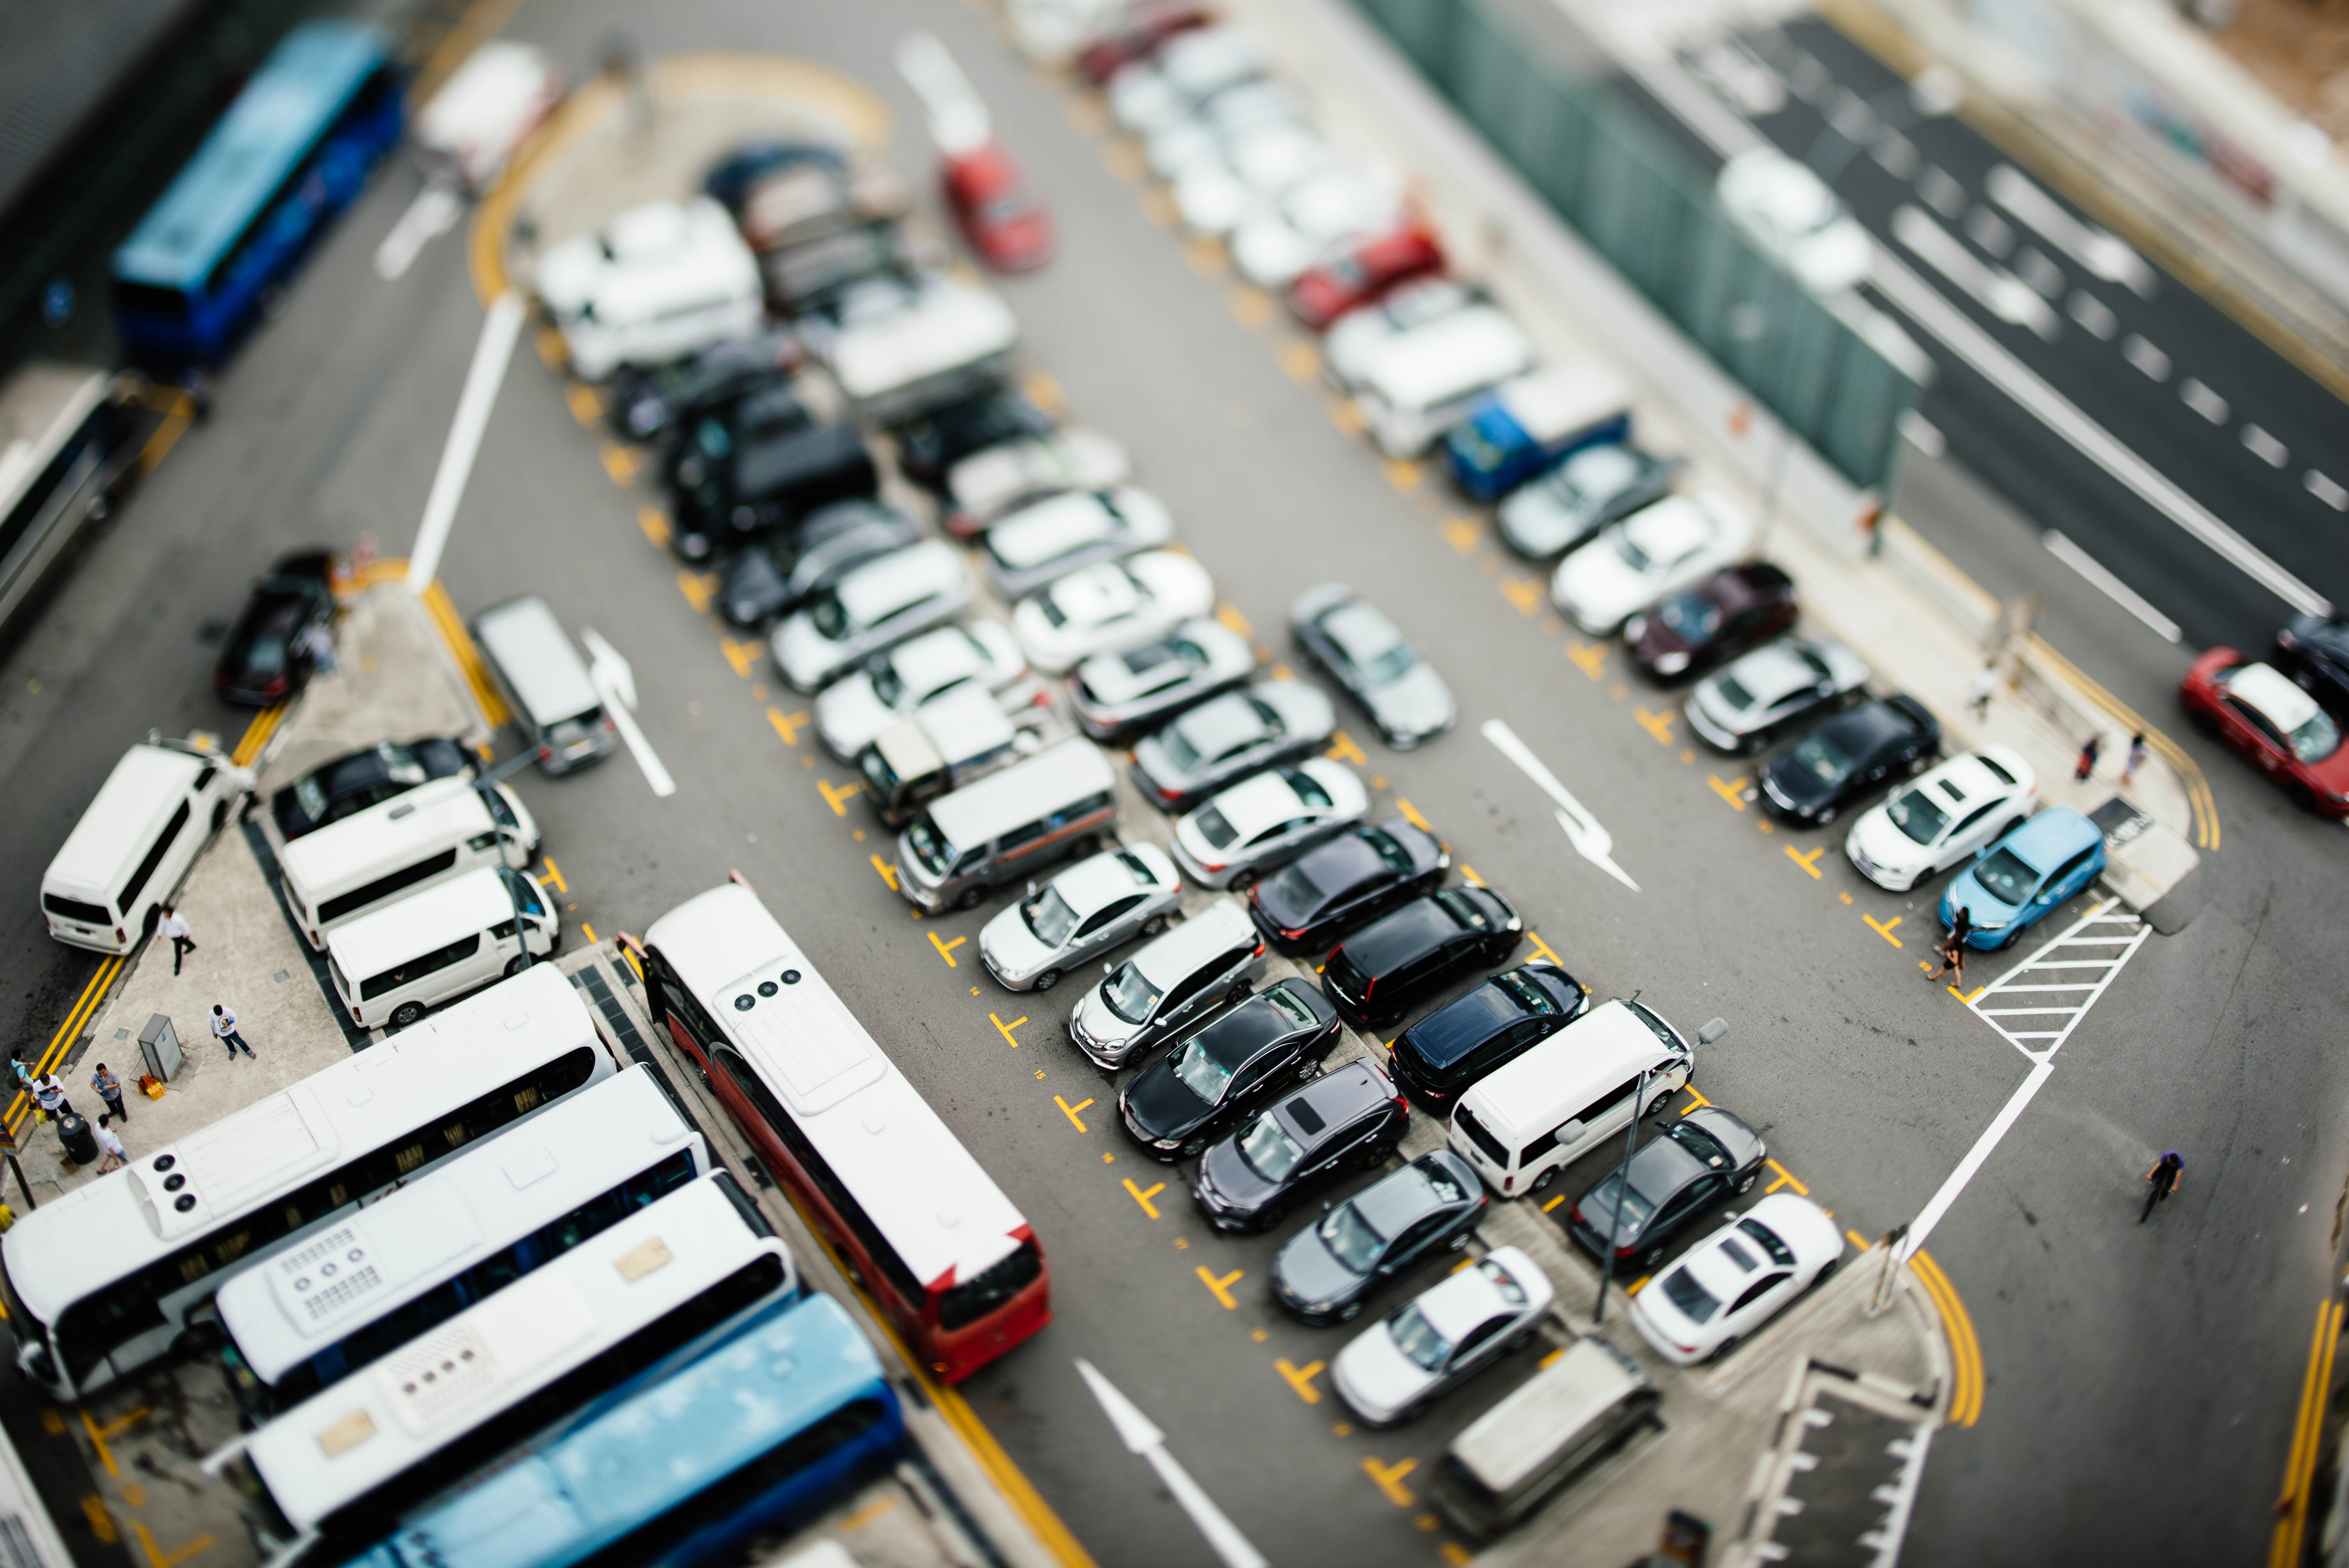 finanzierung i leasing automobila u Njemačkoj